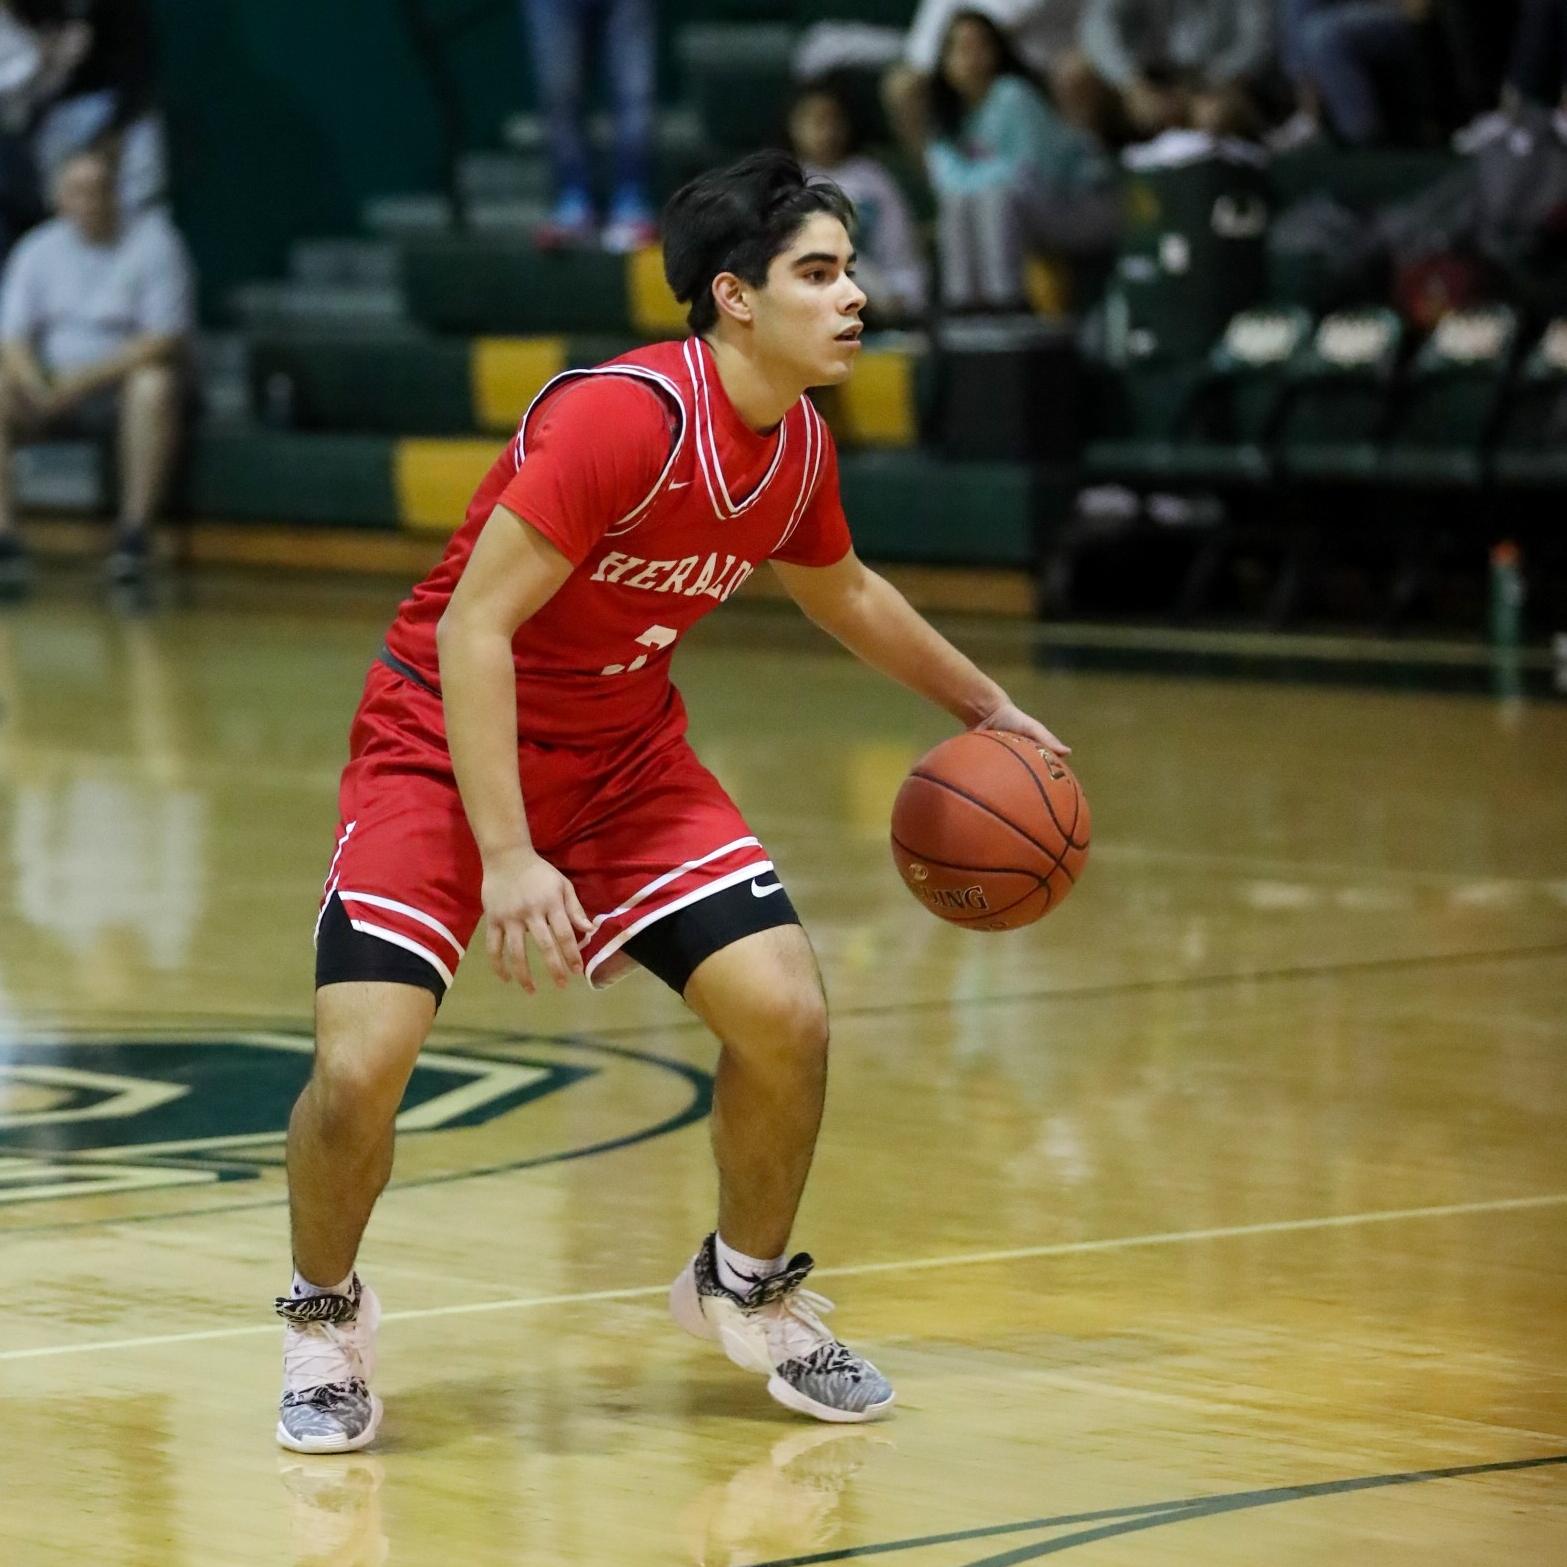 WCHS Boys Varsity Basketball vs. OCHS Pictures